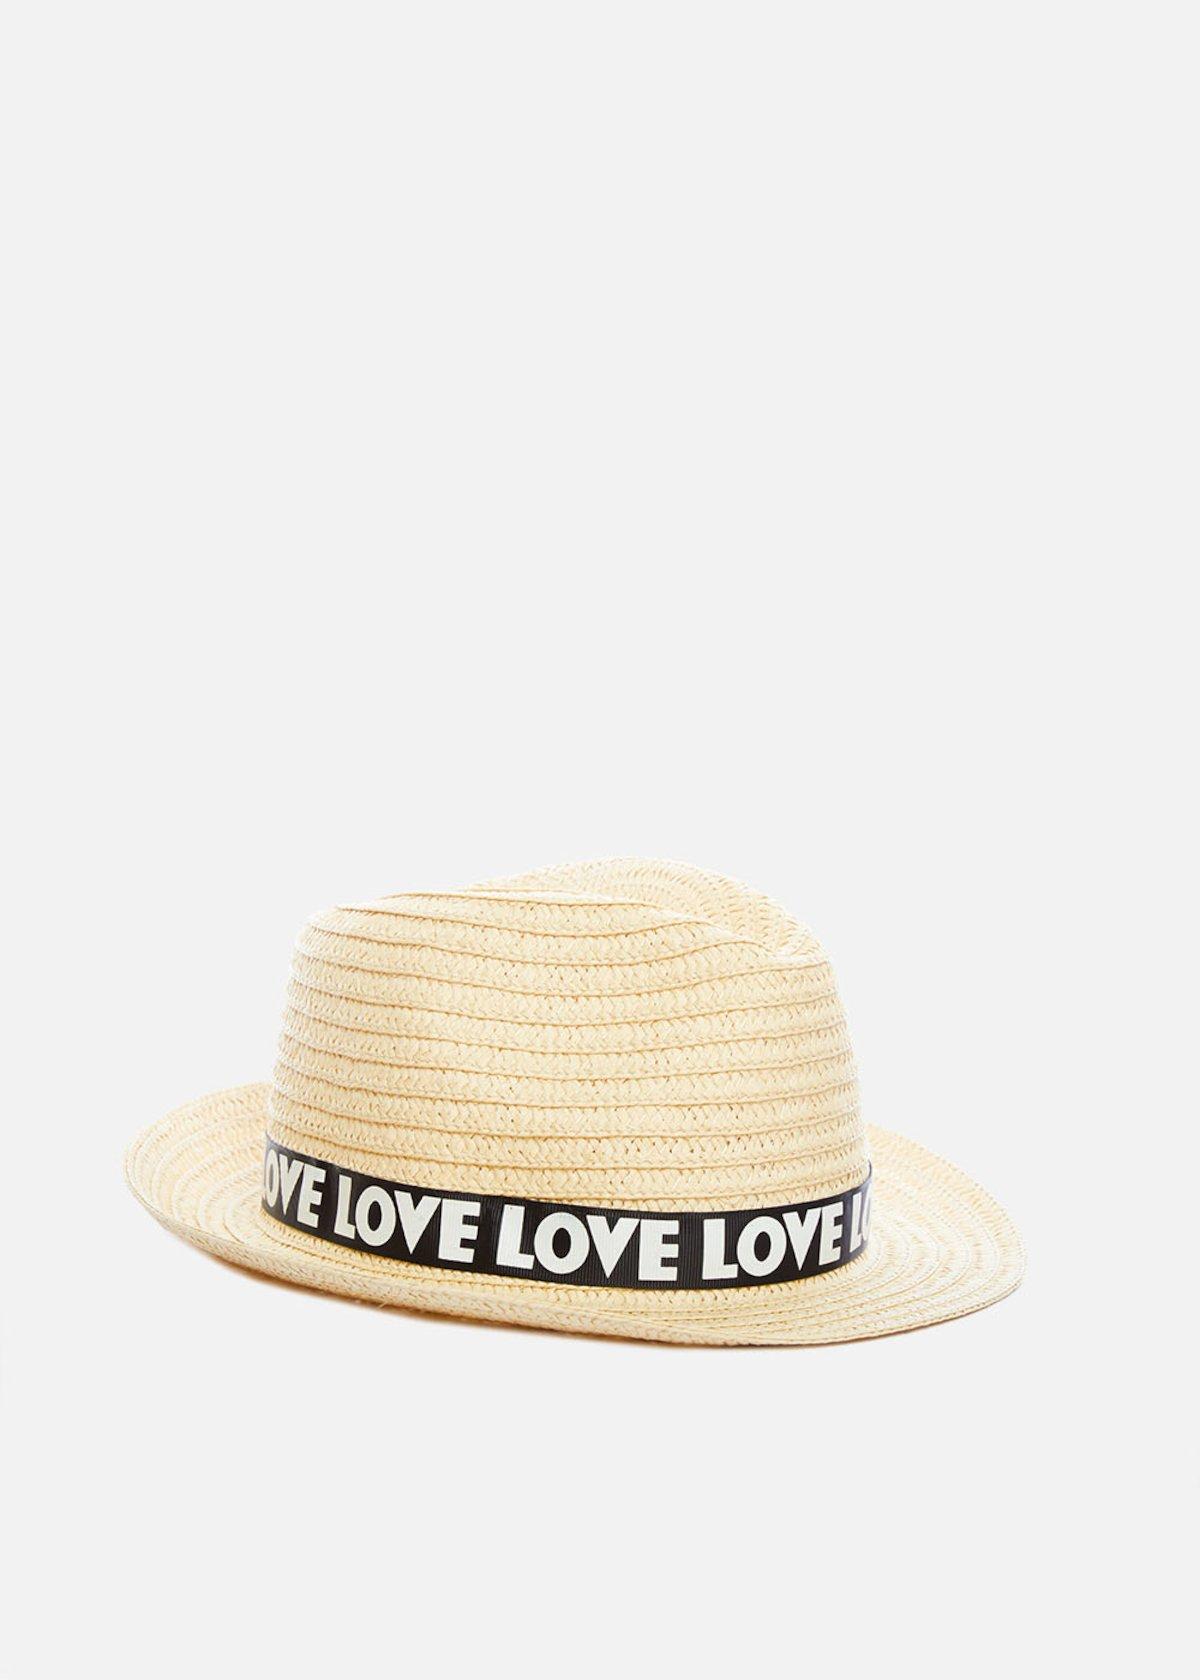 Paper hat natural color Craig con fascia stampa love